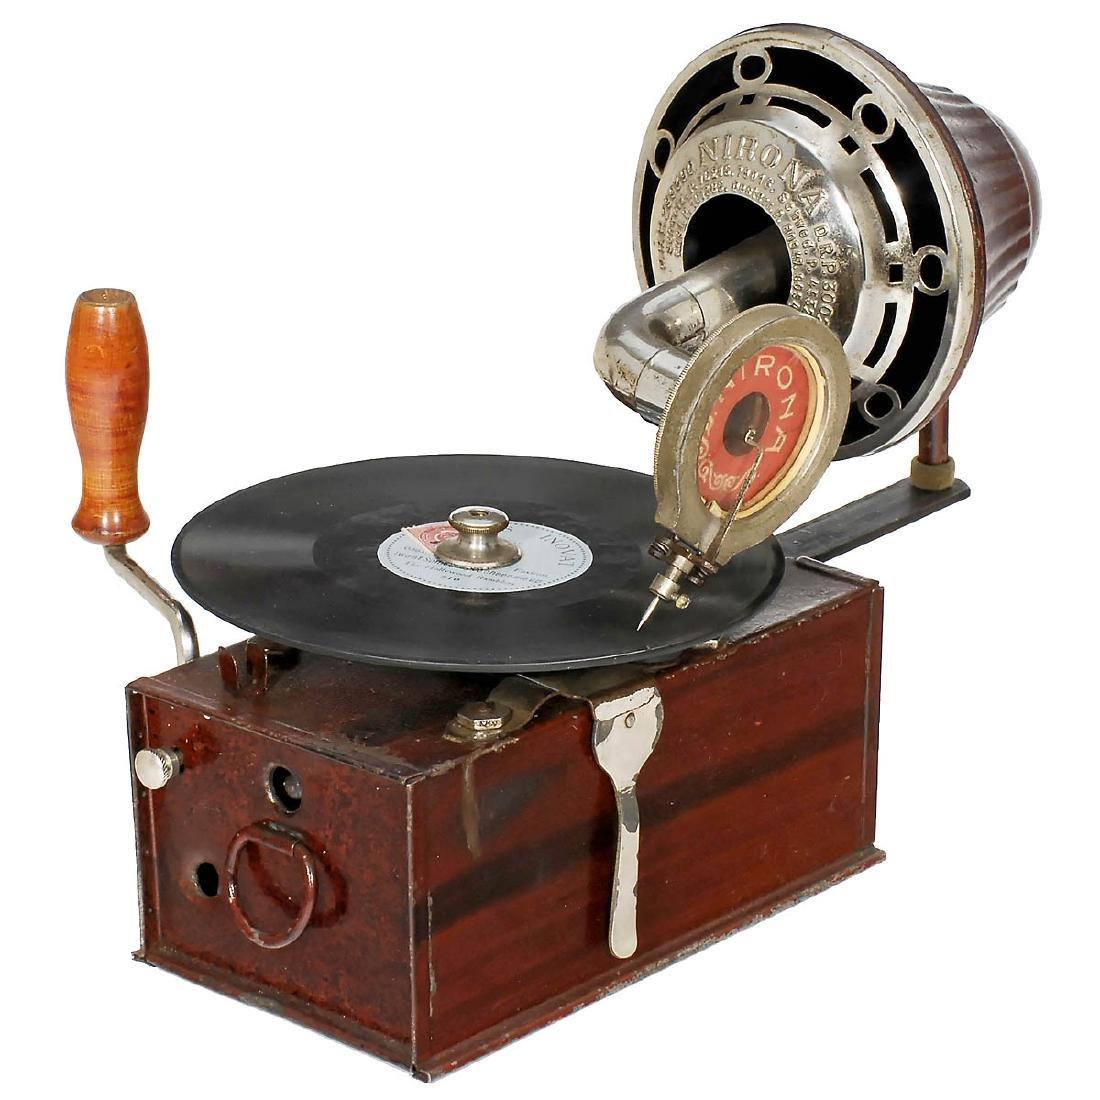 Nirona Gramophone, c. 1920